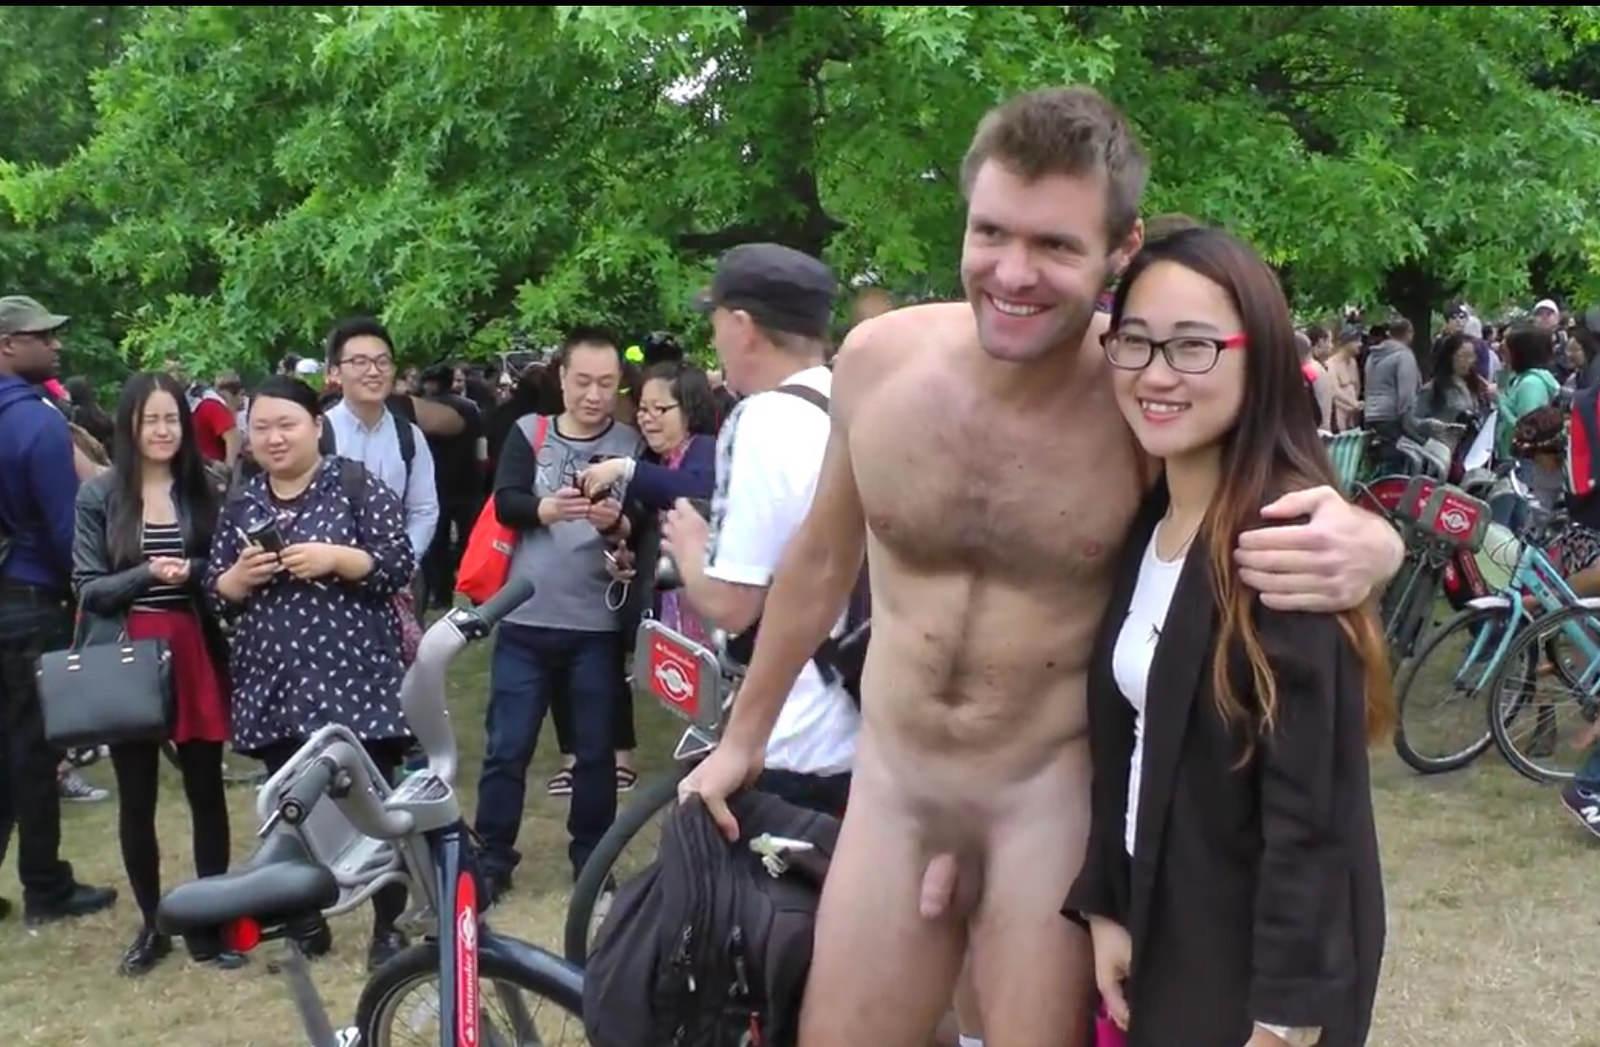 Cfnm Embarrassed Male-6456